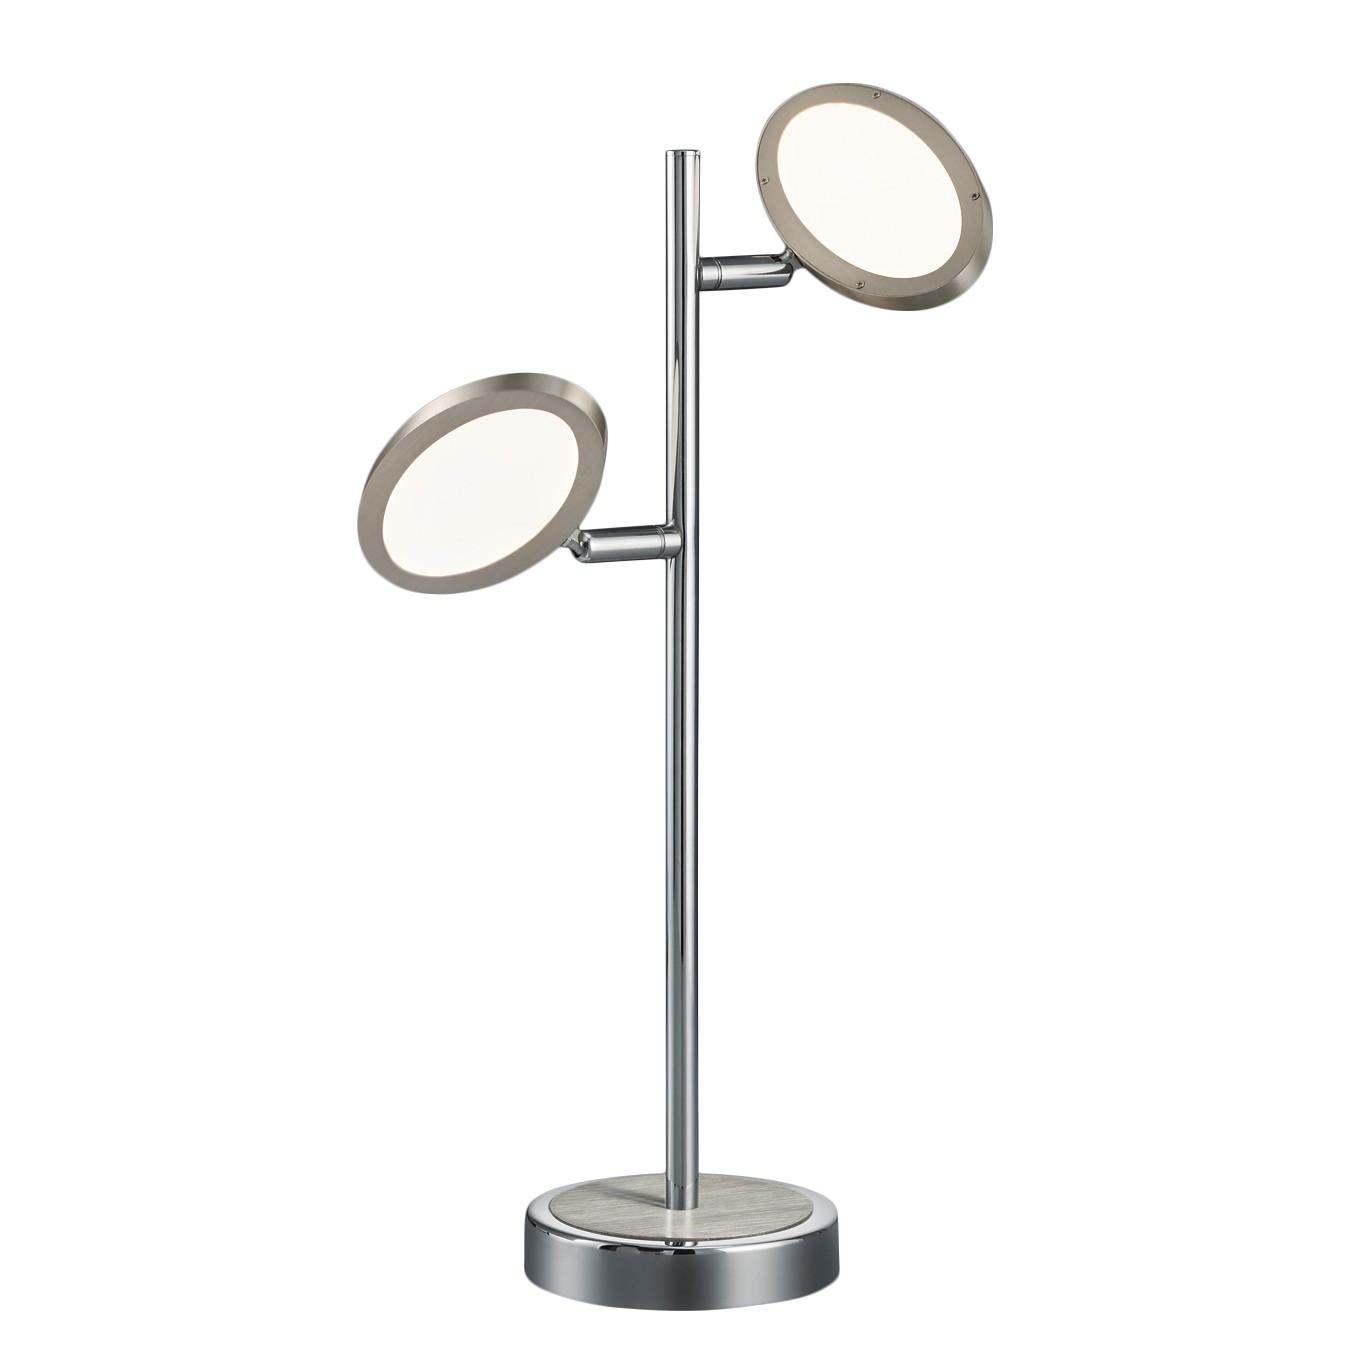 energie  A+, LED-tafellamp Duellant - plexiglas/metaal - 2 lichtbronnen, Trio